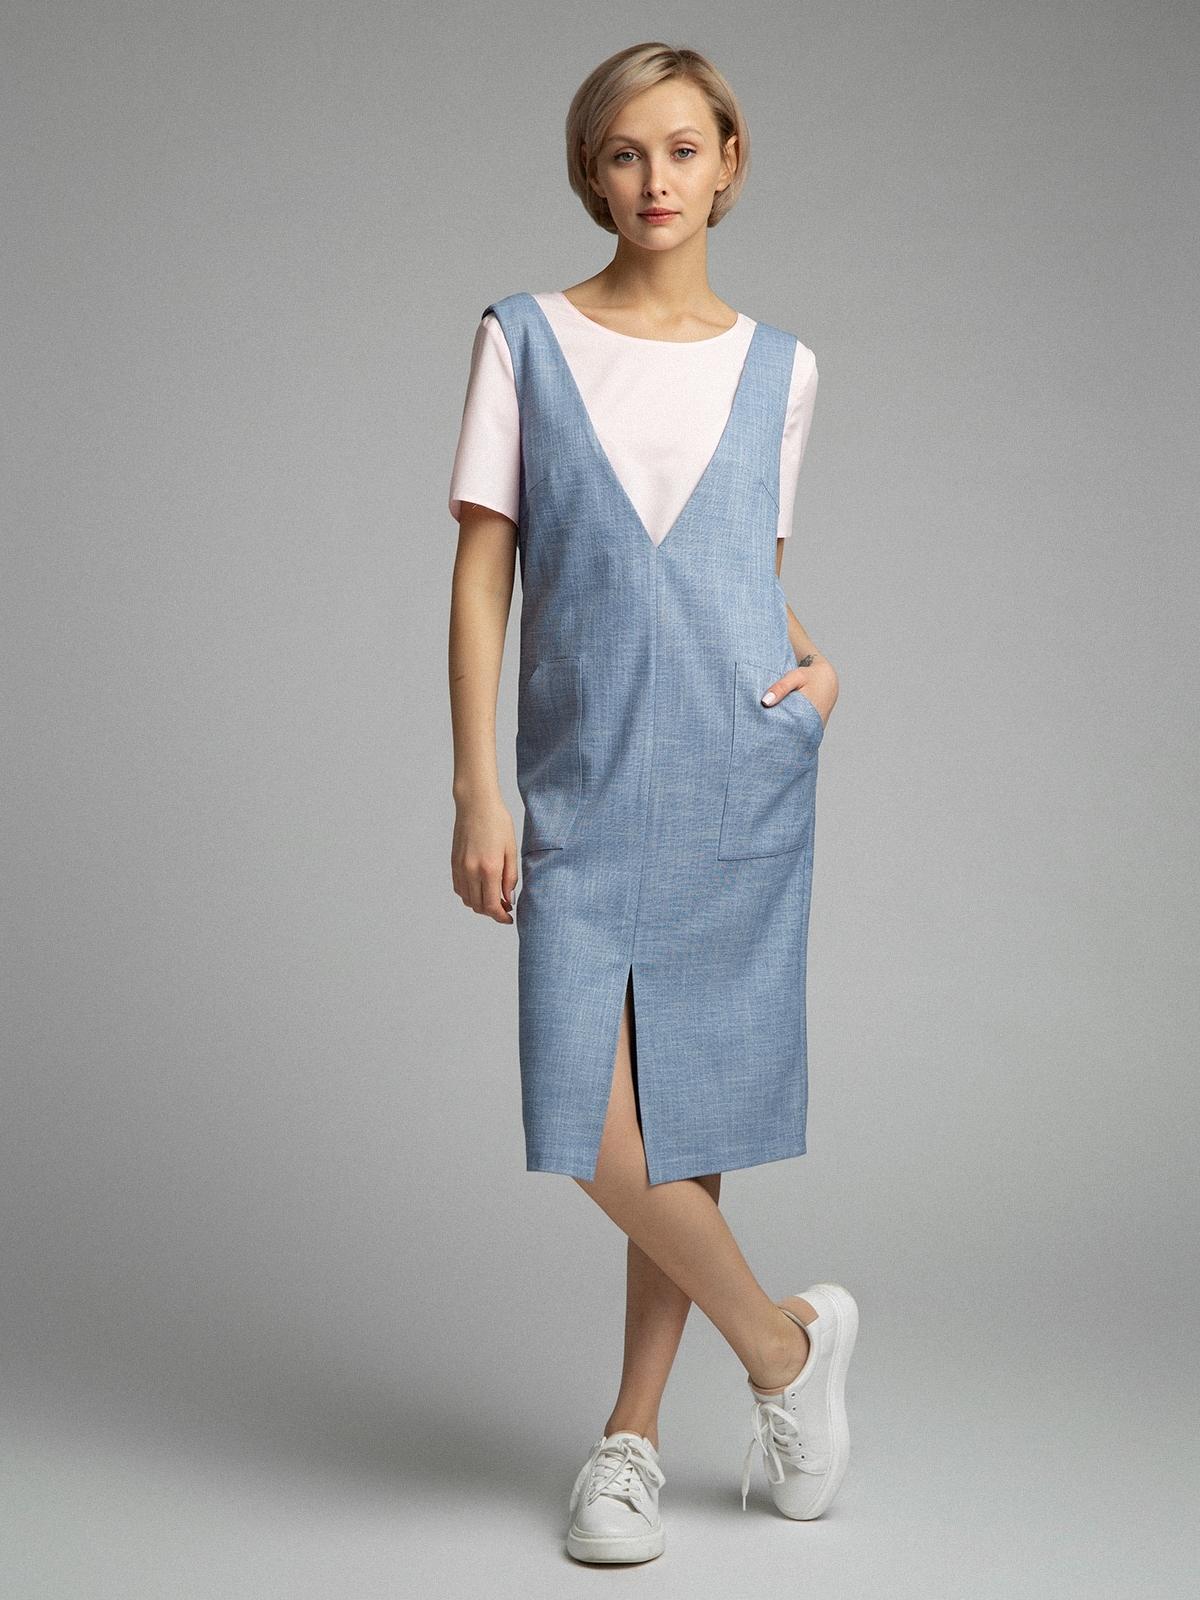 Сарафаны Платье-сарафан с накладными карманами PL1097/kevin HF8B1014.jpg